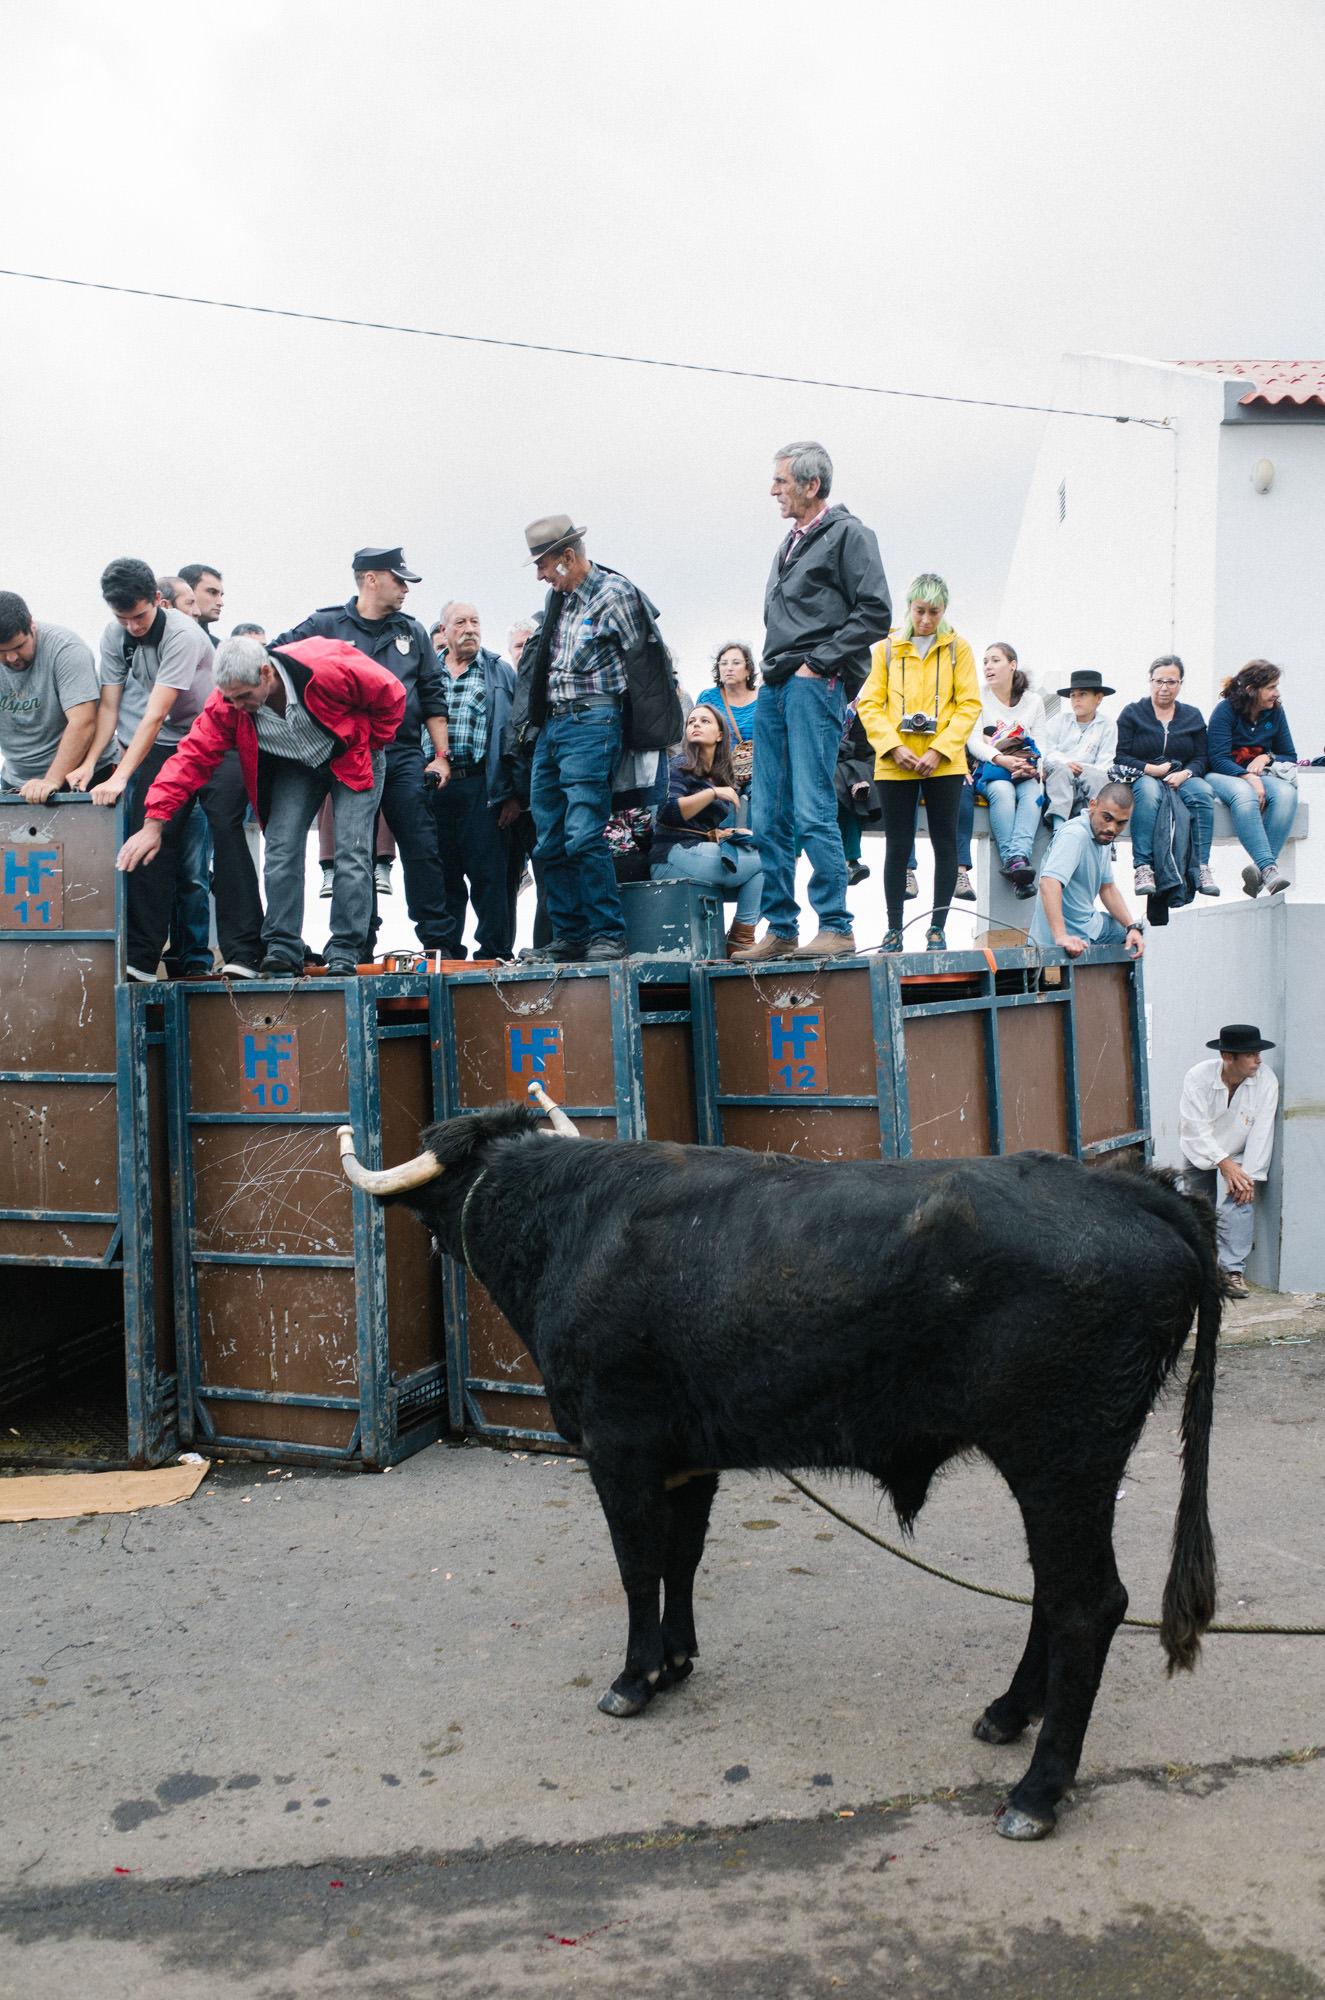 wrenee-renee-lusano-azores-portugal-30.jpg